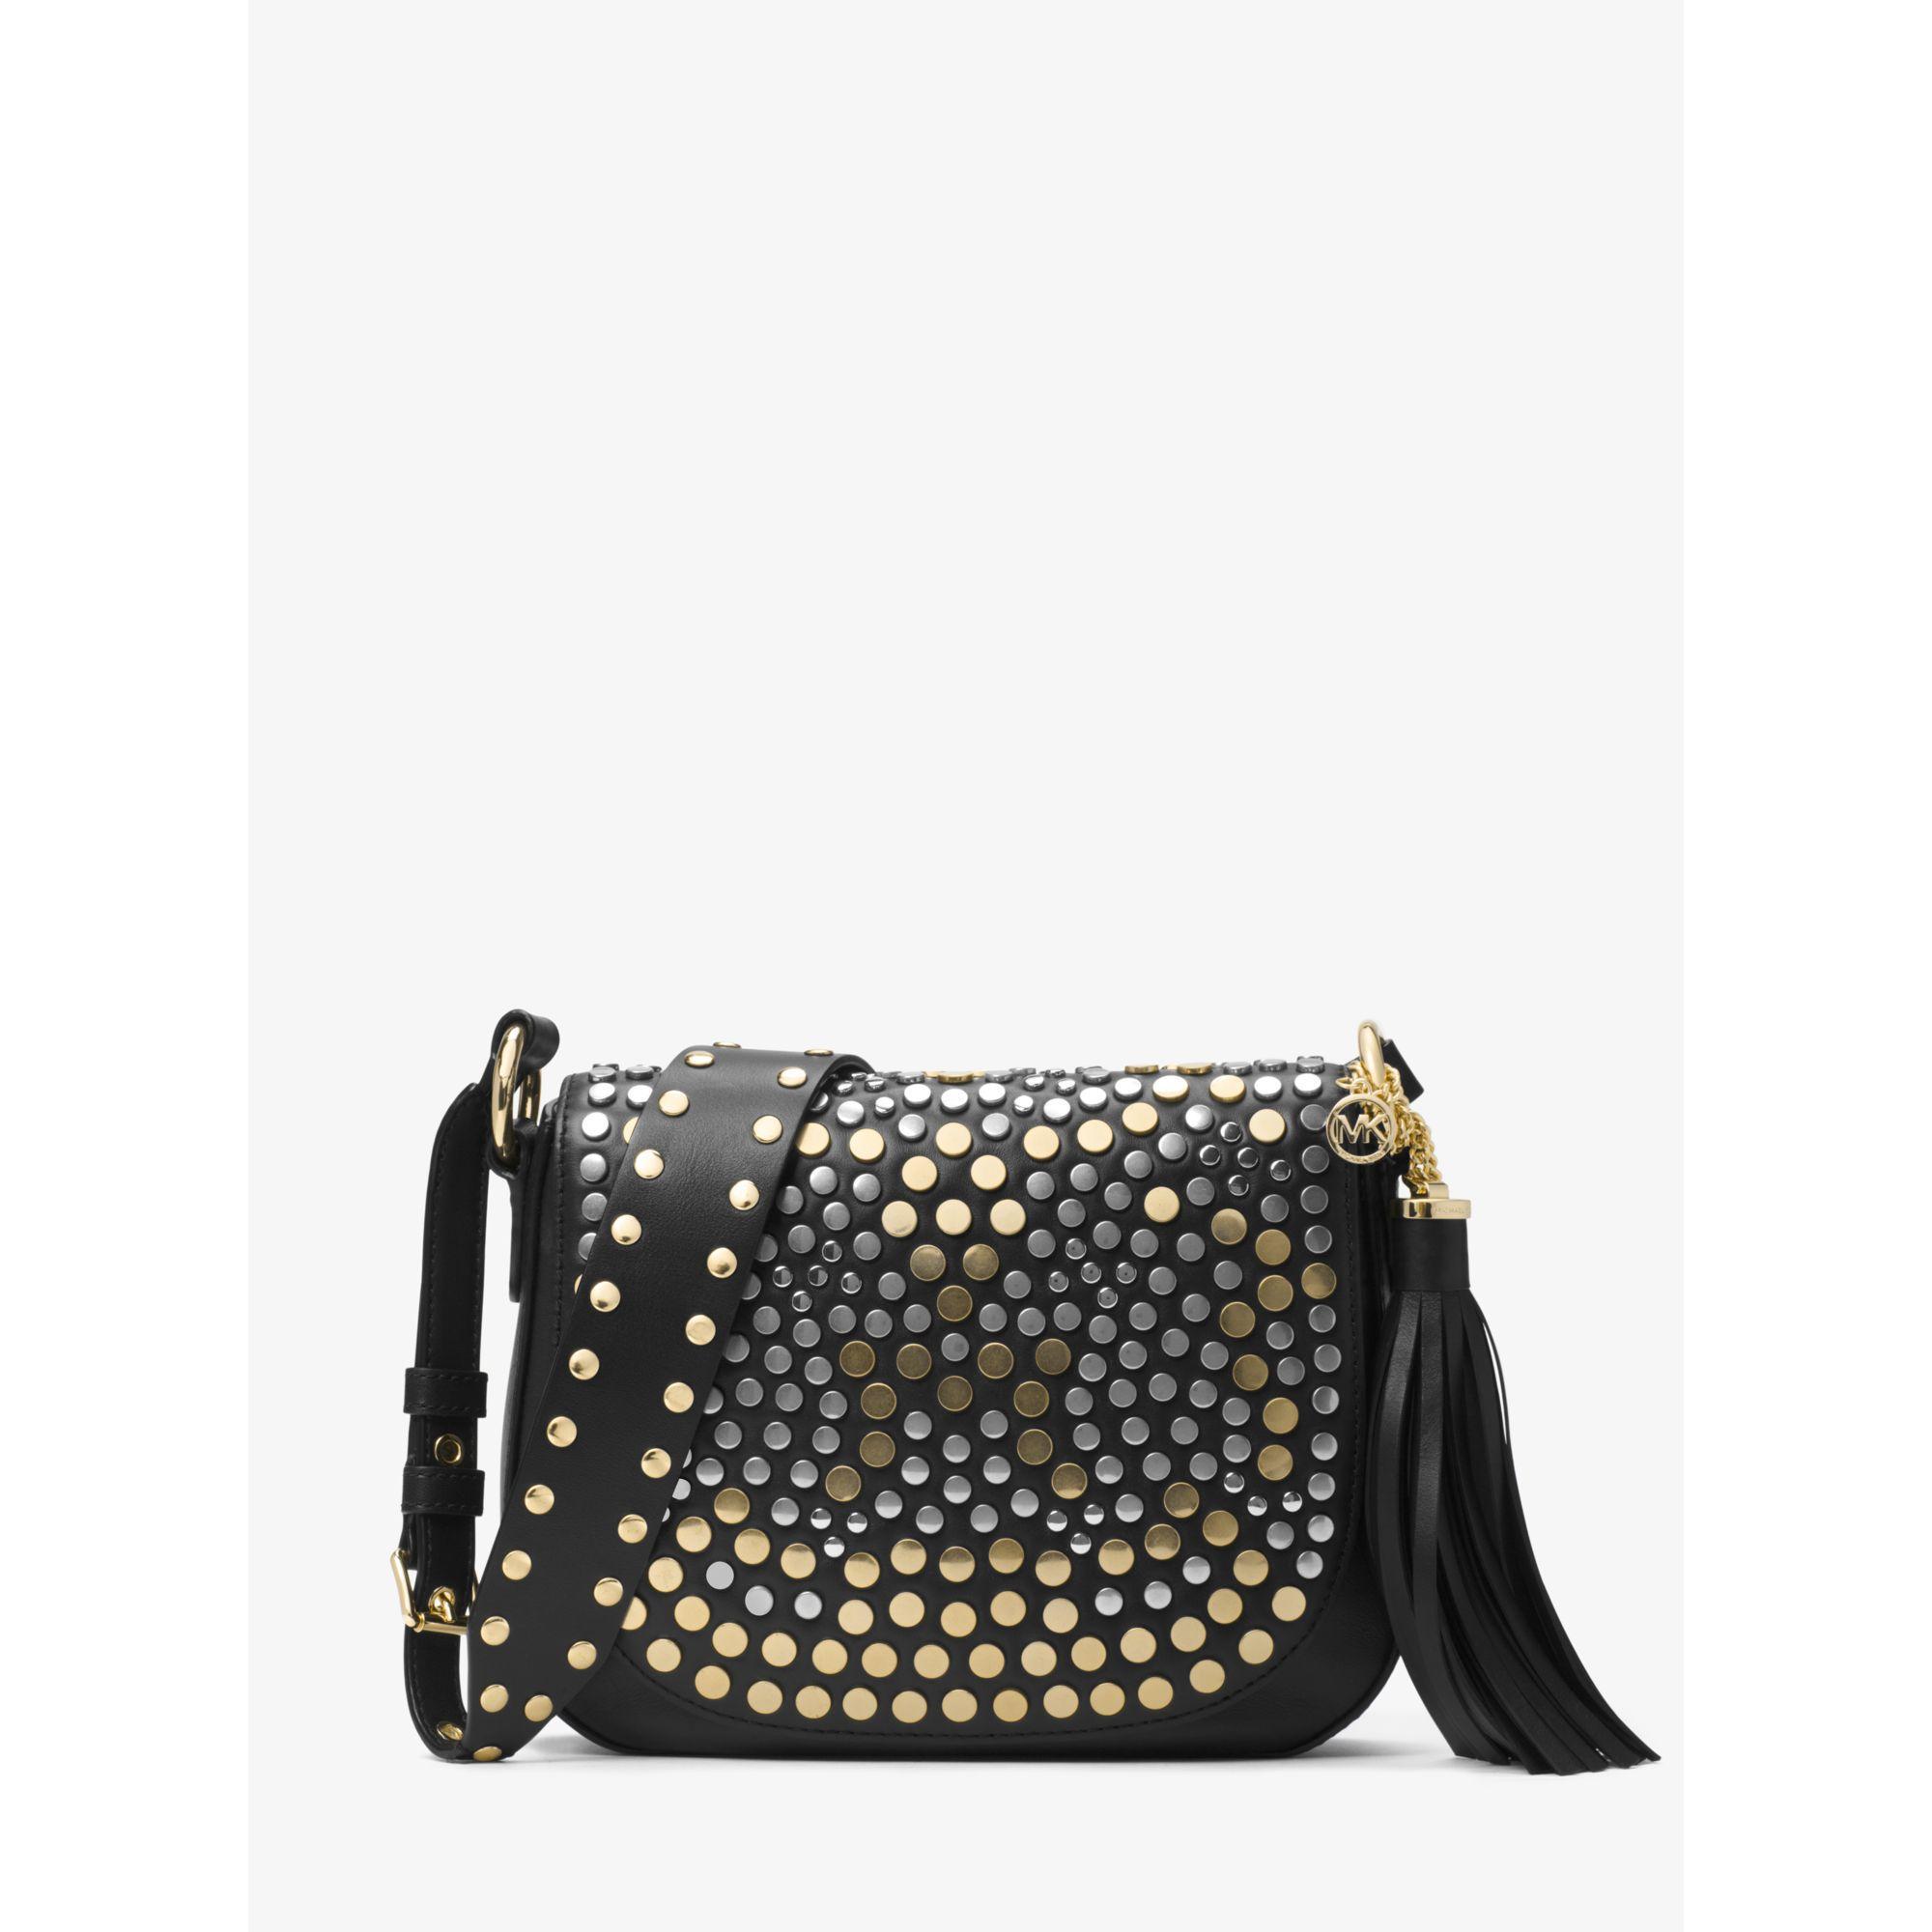 a33e83bef8d7 Lyst - Michael Kors Brooklyn Medium Studded Leather Saddle Bag in Black